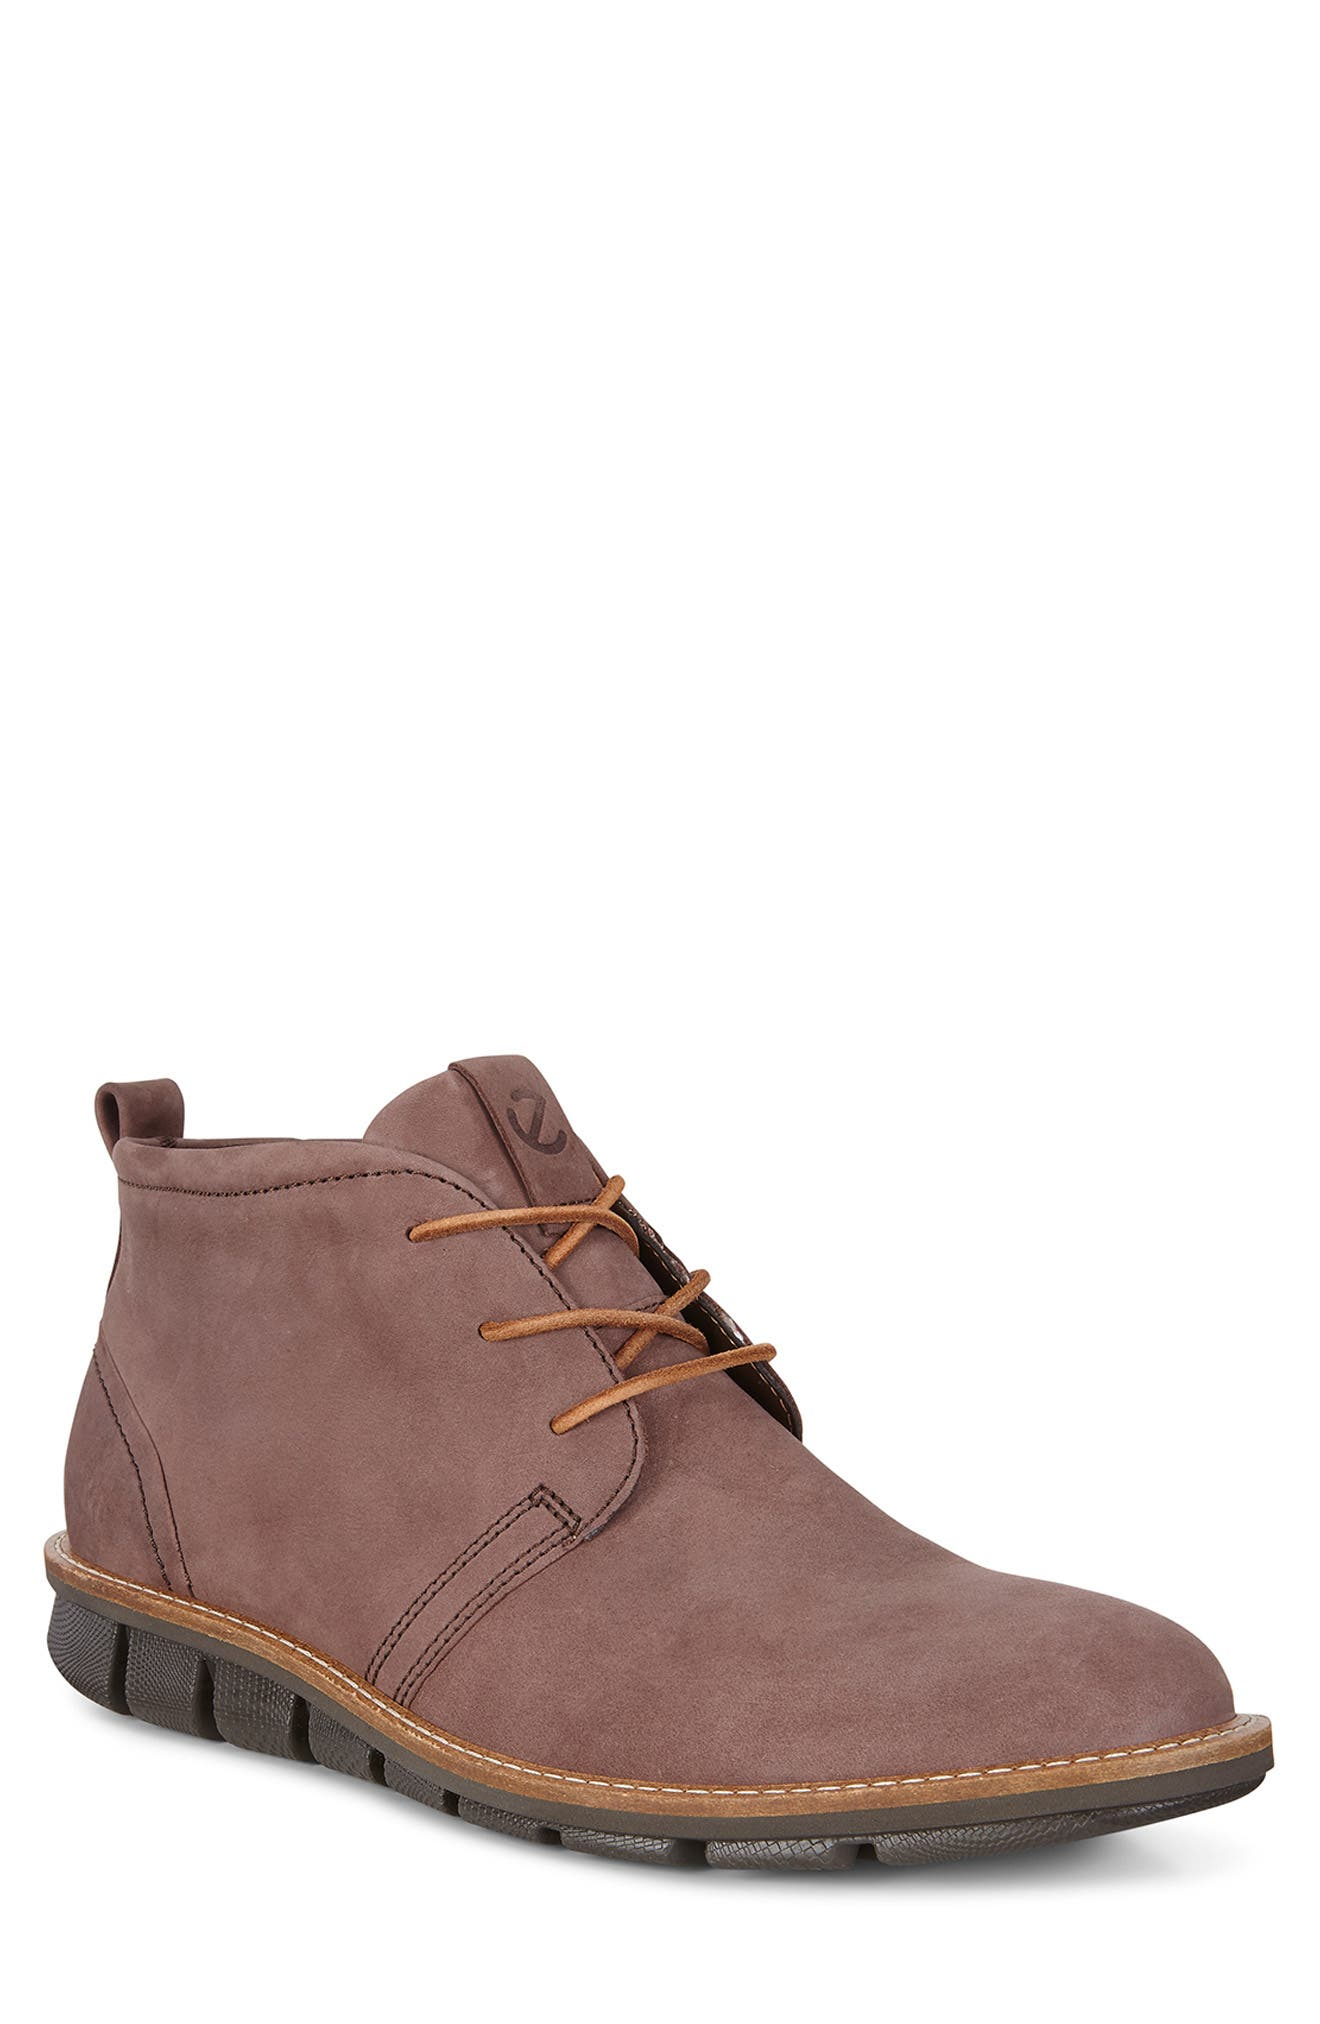 'Jeremy Hybrid' Plain Toe Boot,                             Main thumbnail 1, color,                             COFFEE LEATHER